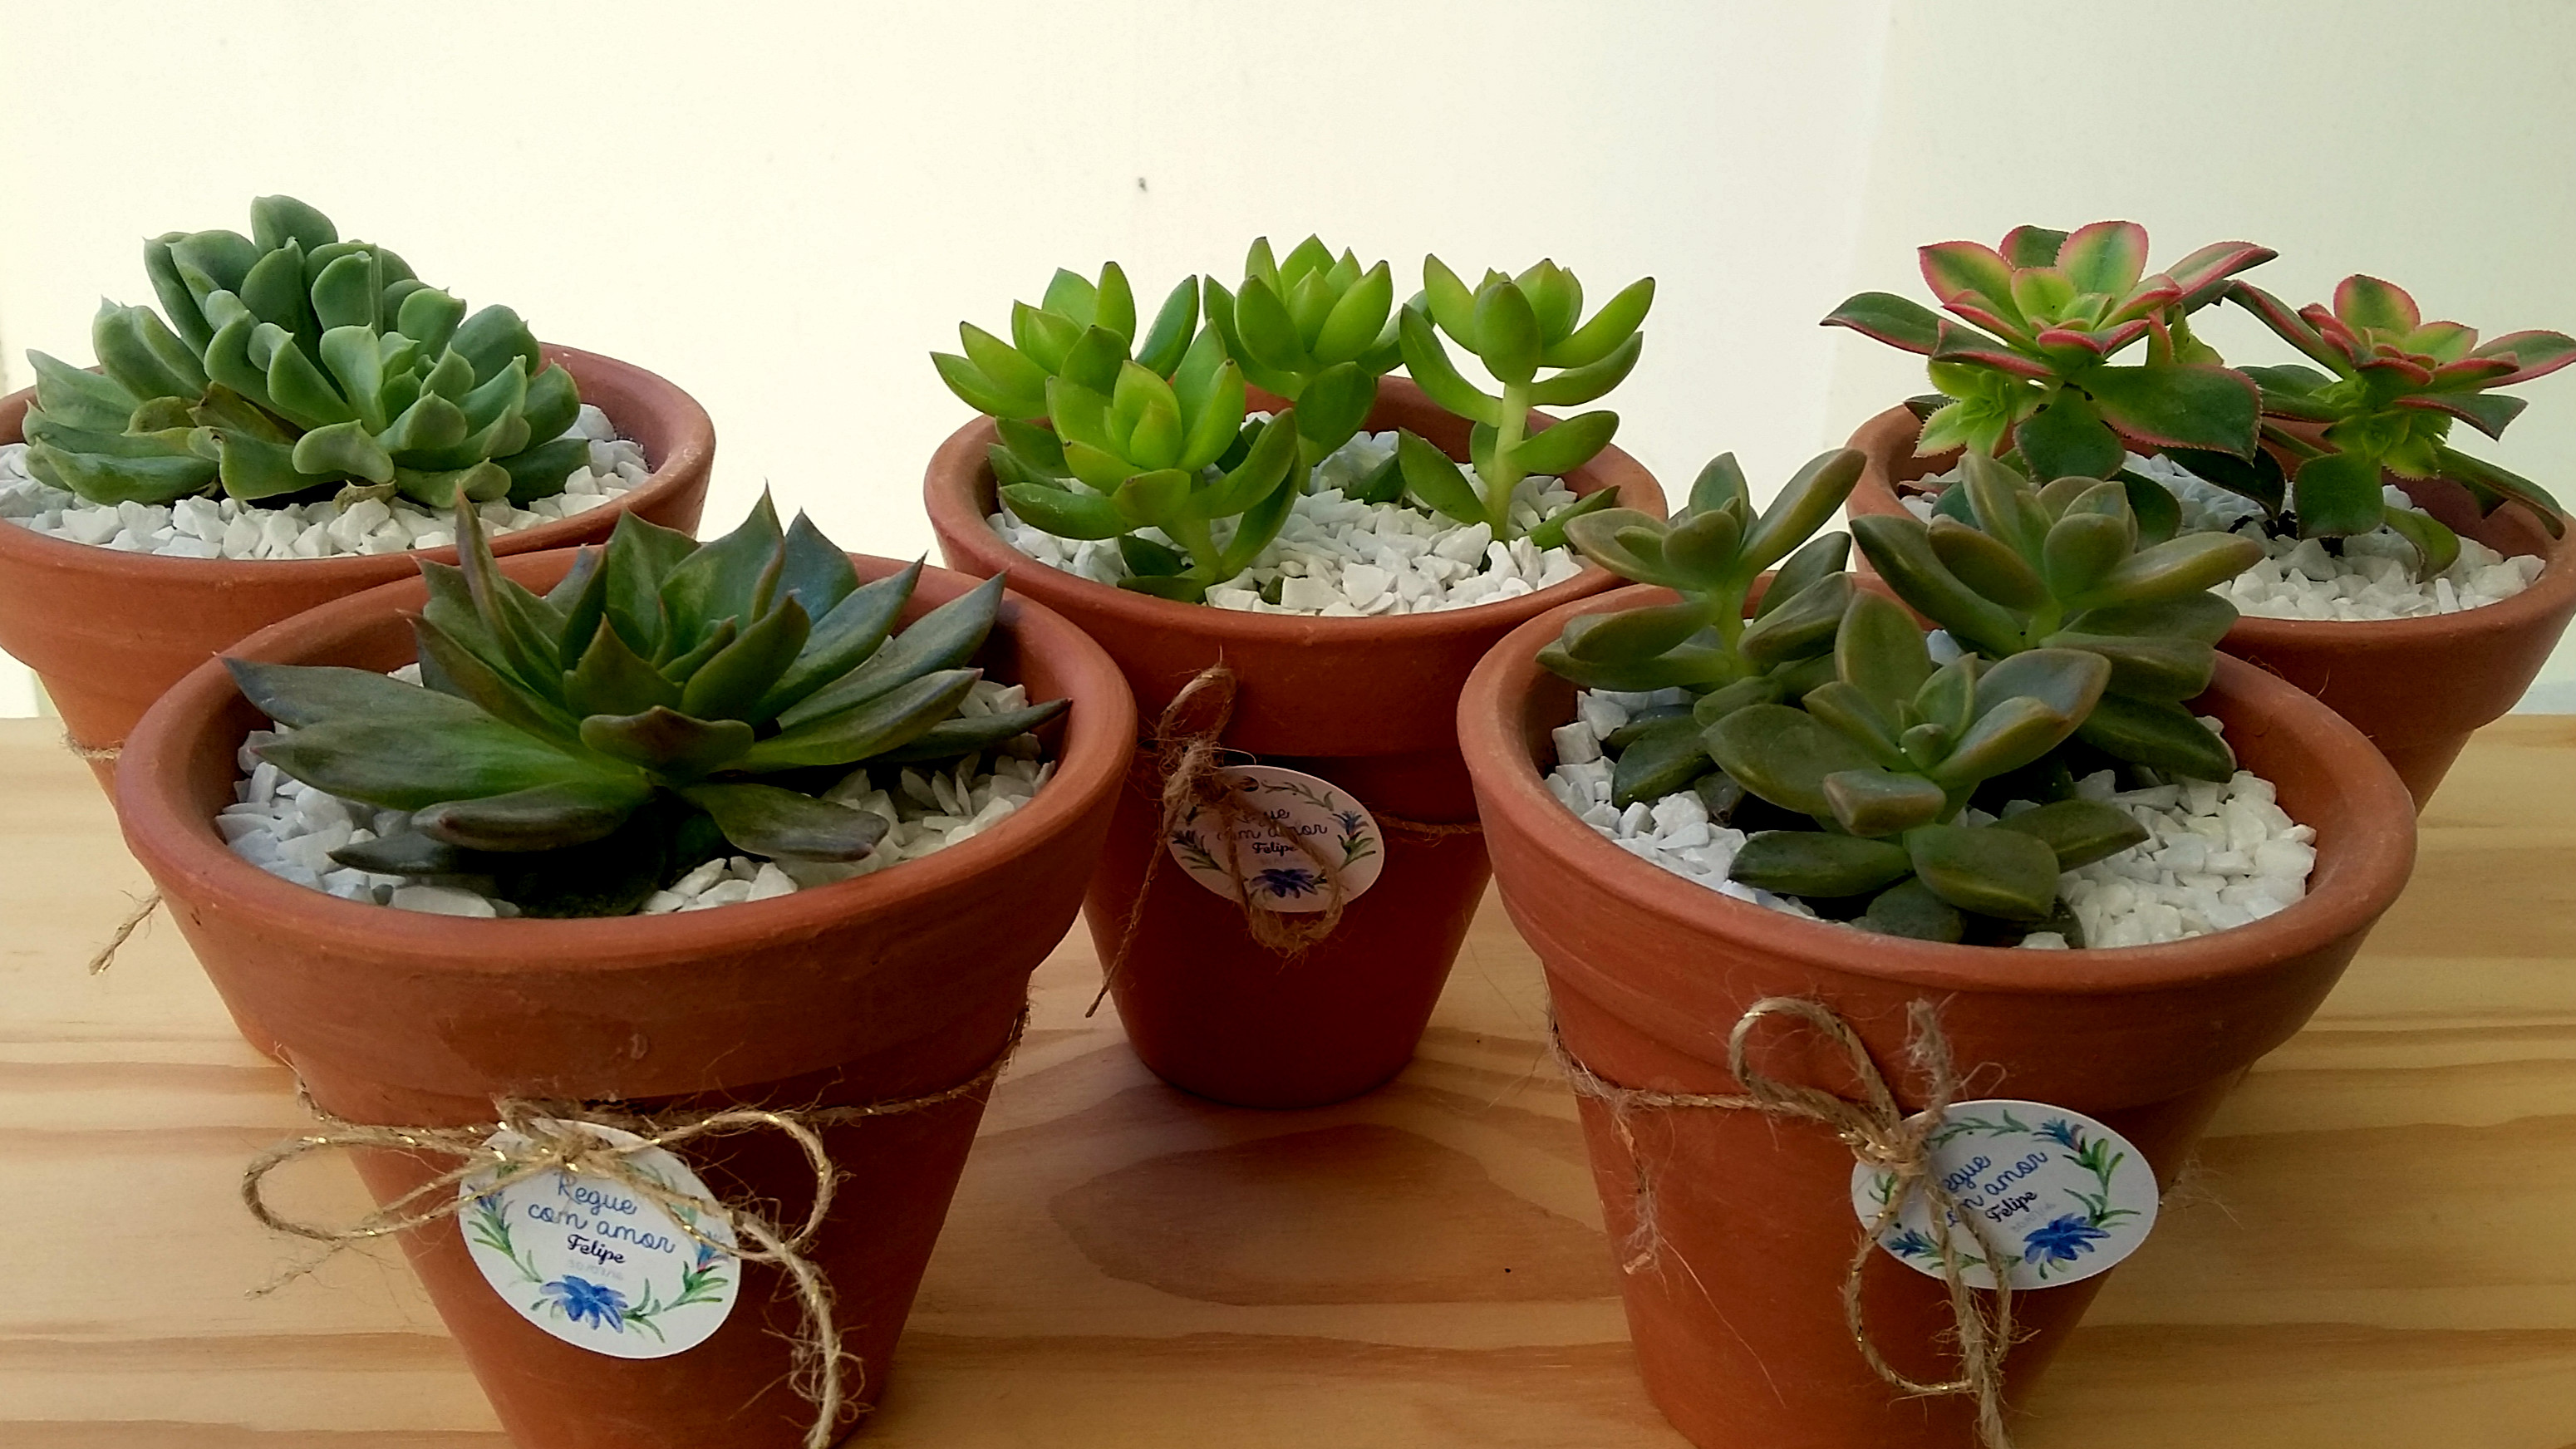 Vaso suculentas grande incantare paisagens e flores elo7 for Decoracion con plantas crasas